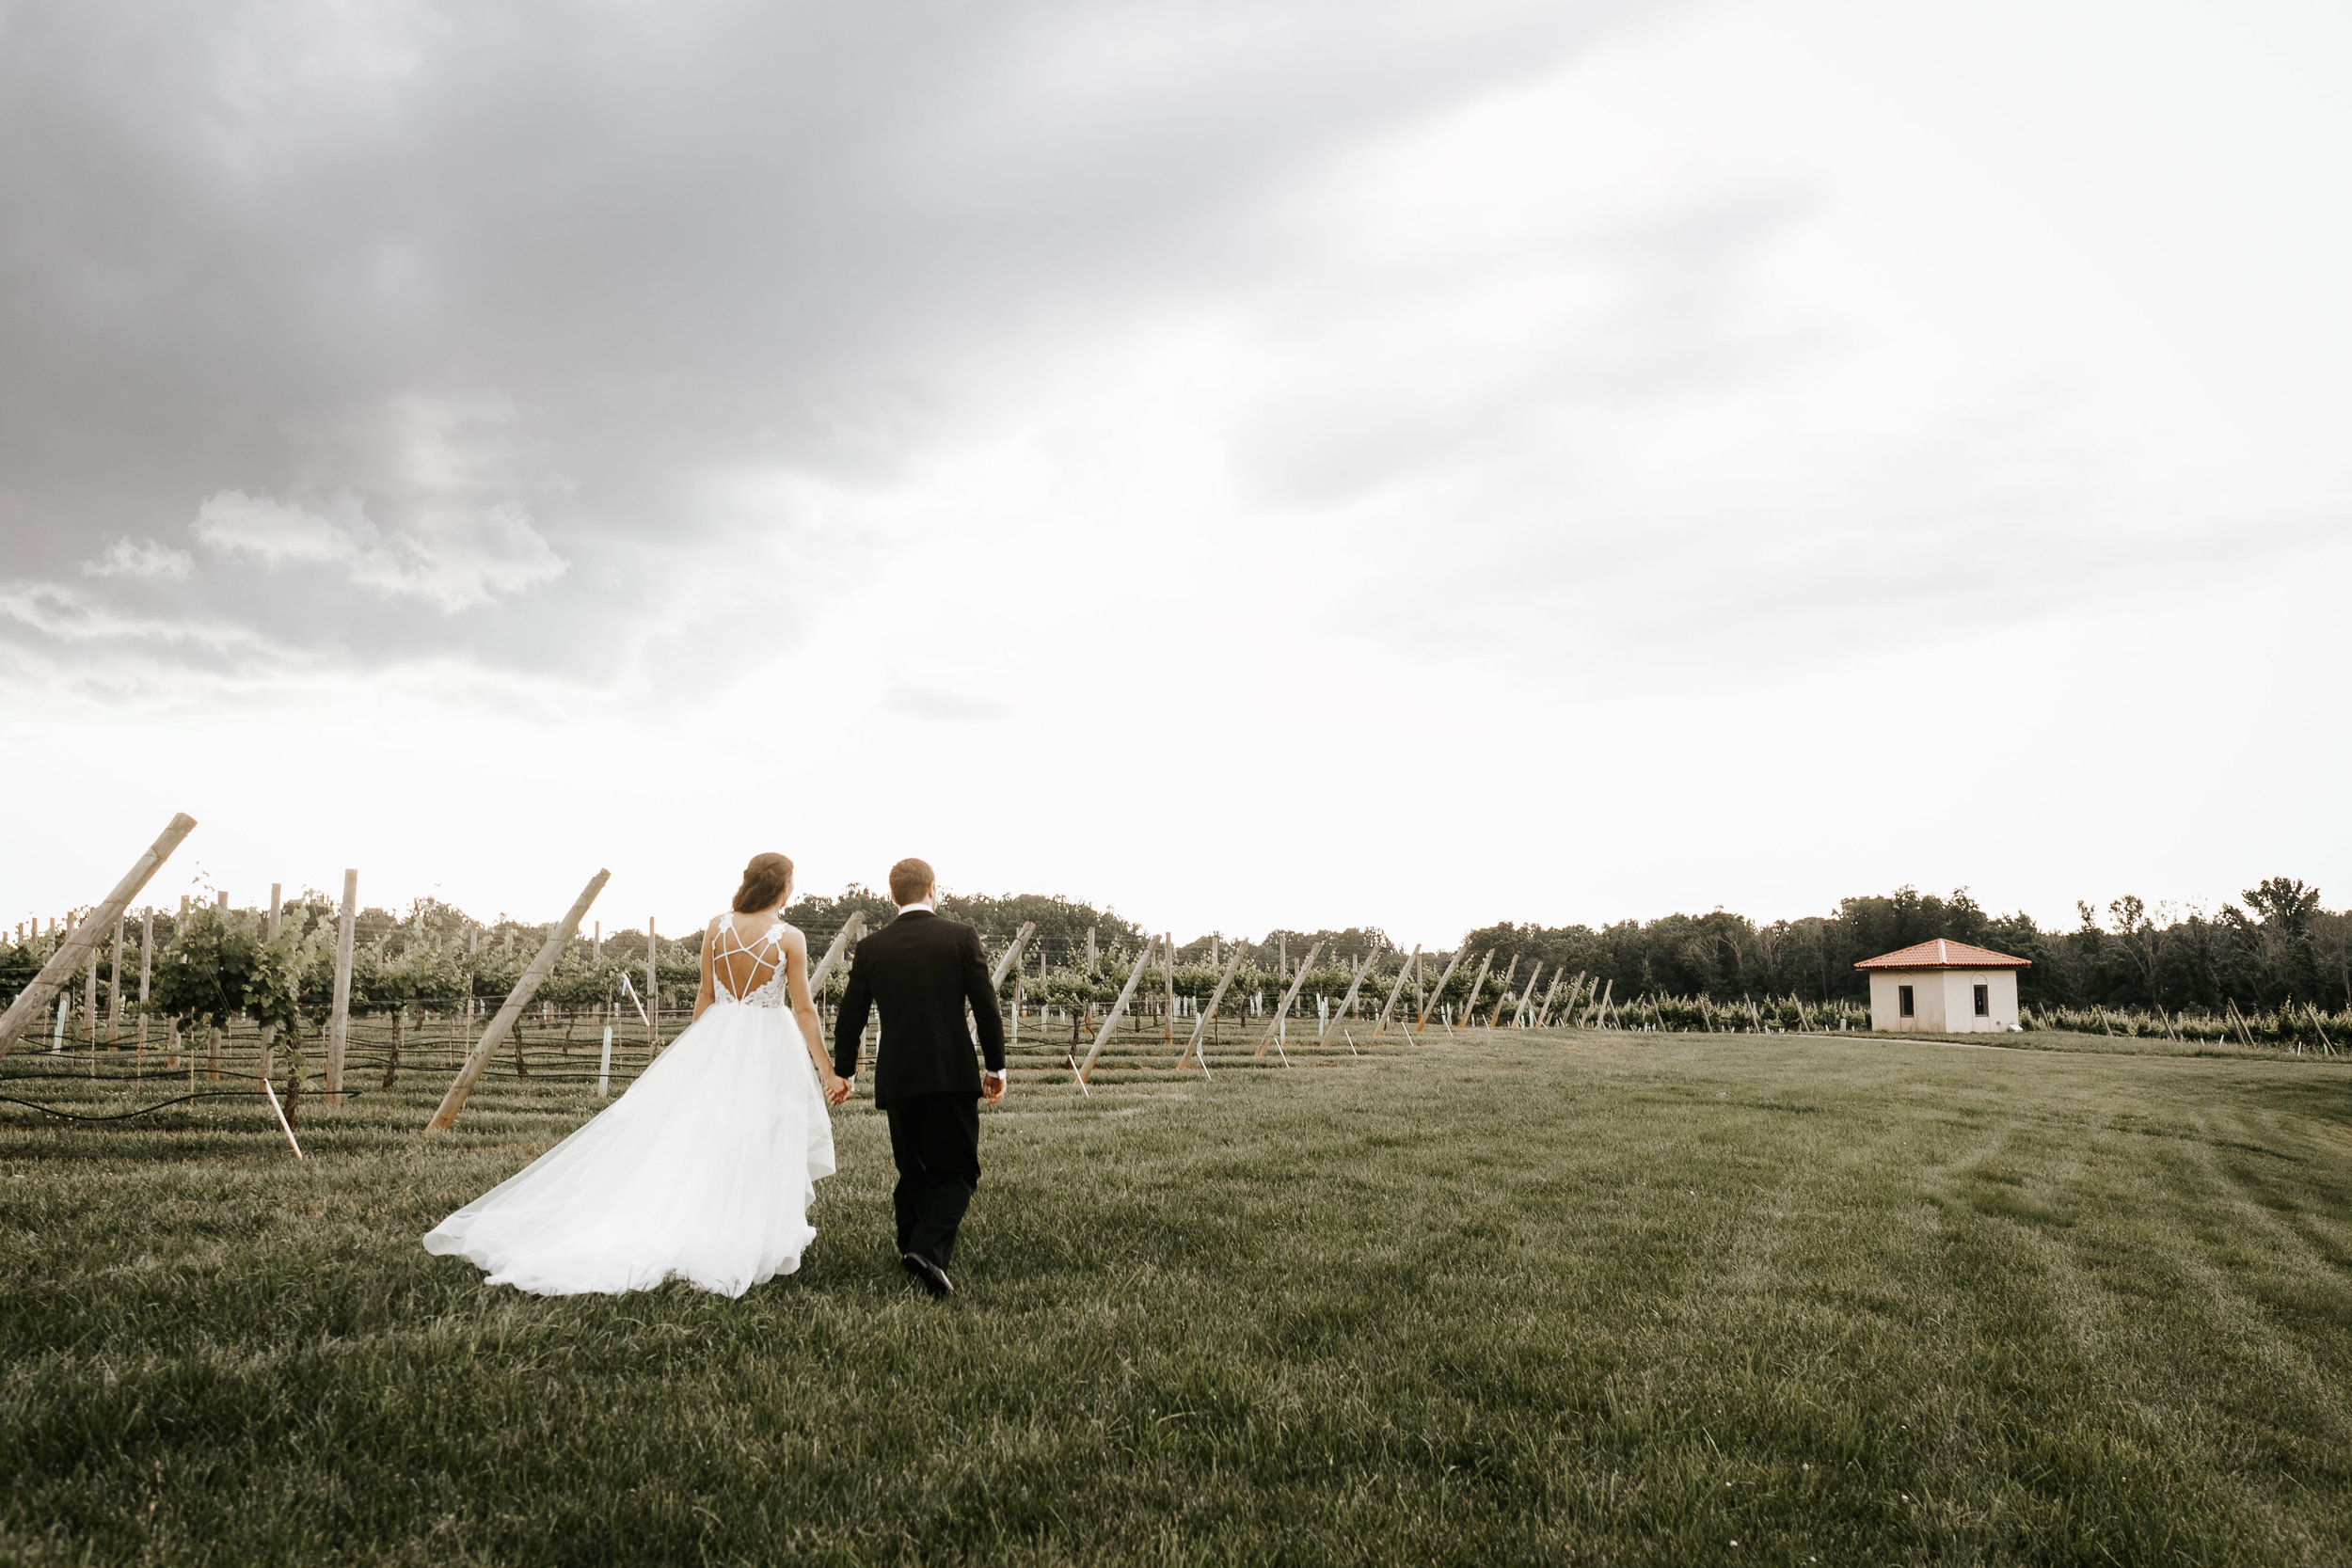 Bohemian-Wedding-Elopement-Photographer-Carolina-63.jpg